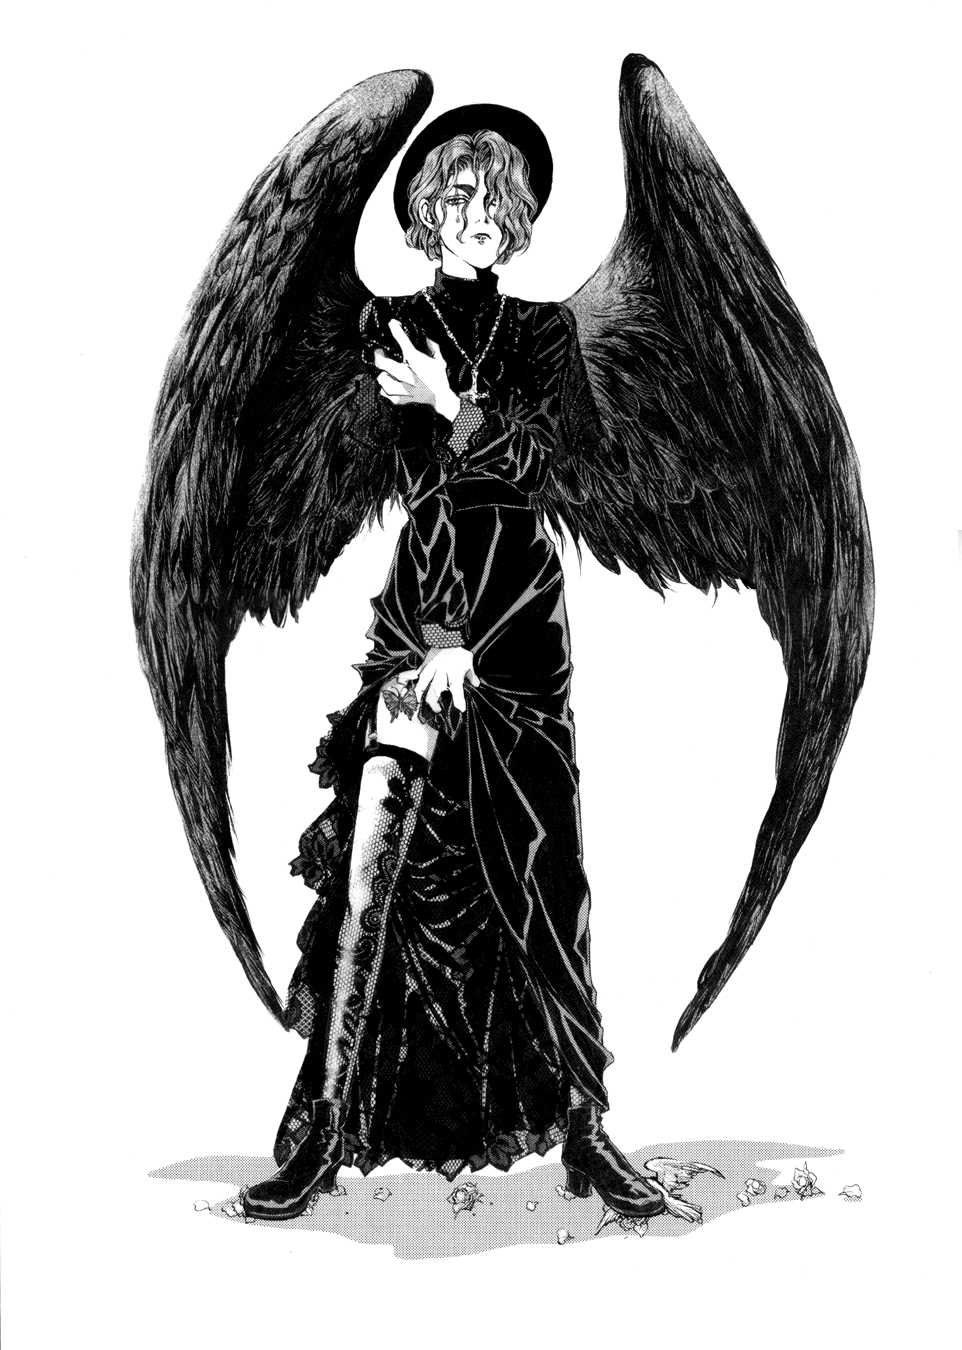 Belial from Kaori Yuki's Angel Sanctuary.